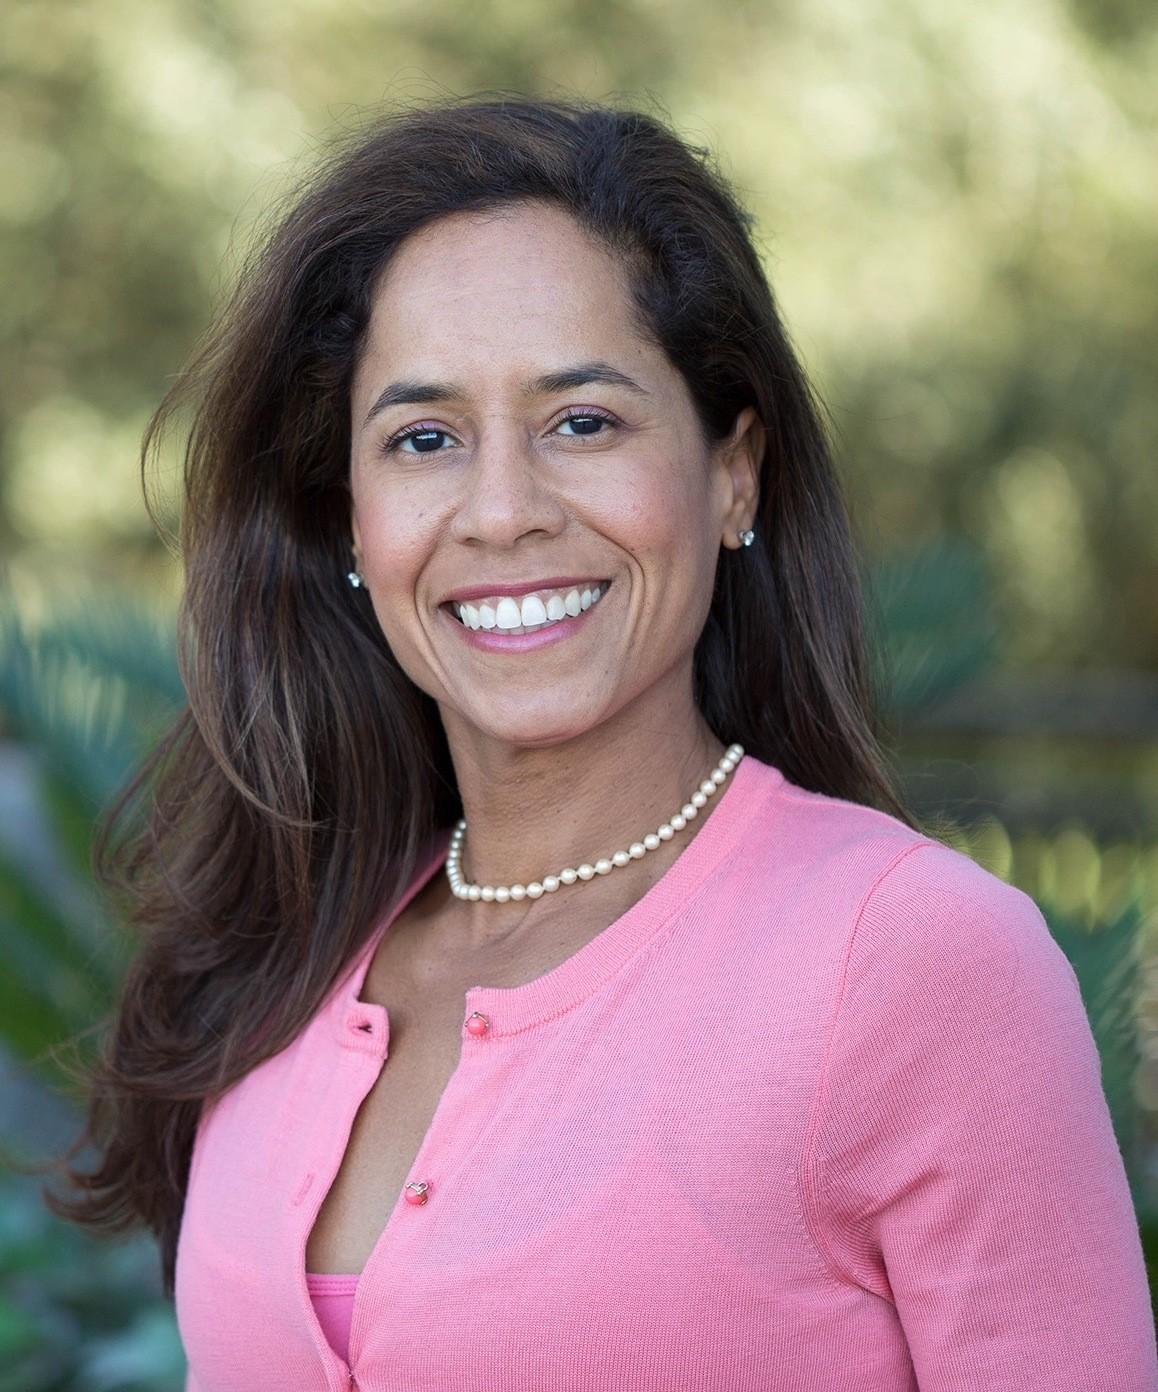 Nicole Payseur, JD's Headshot